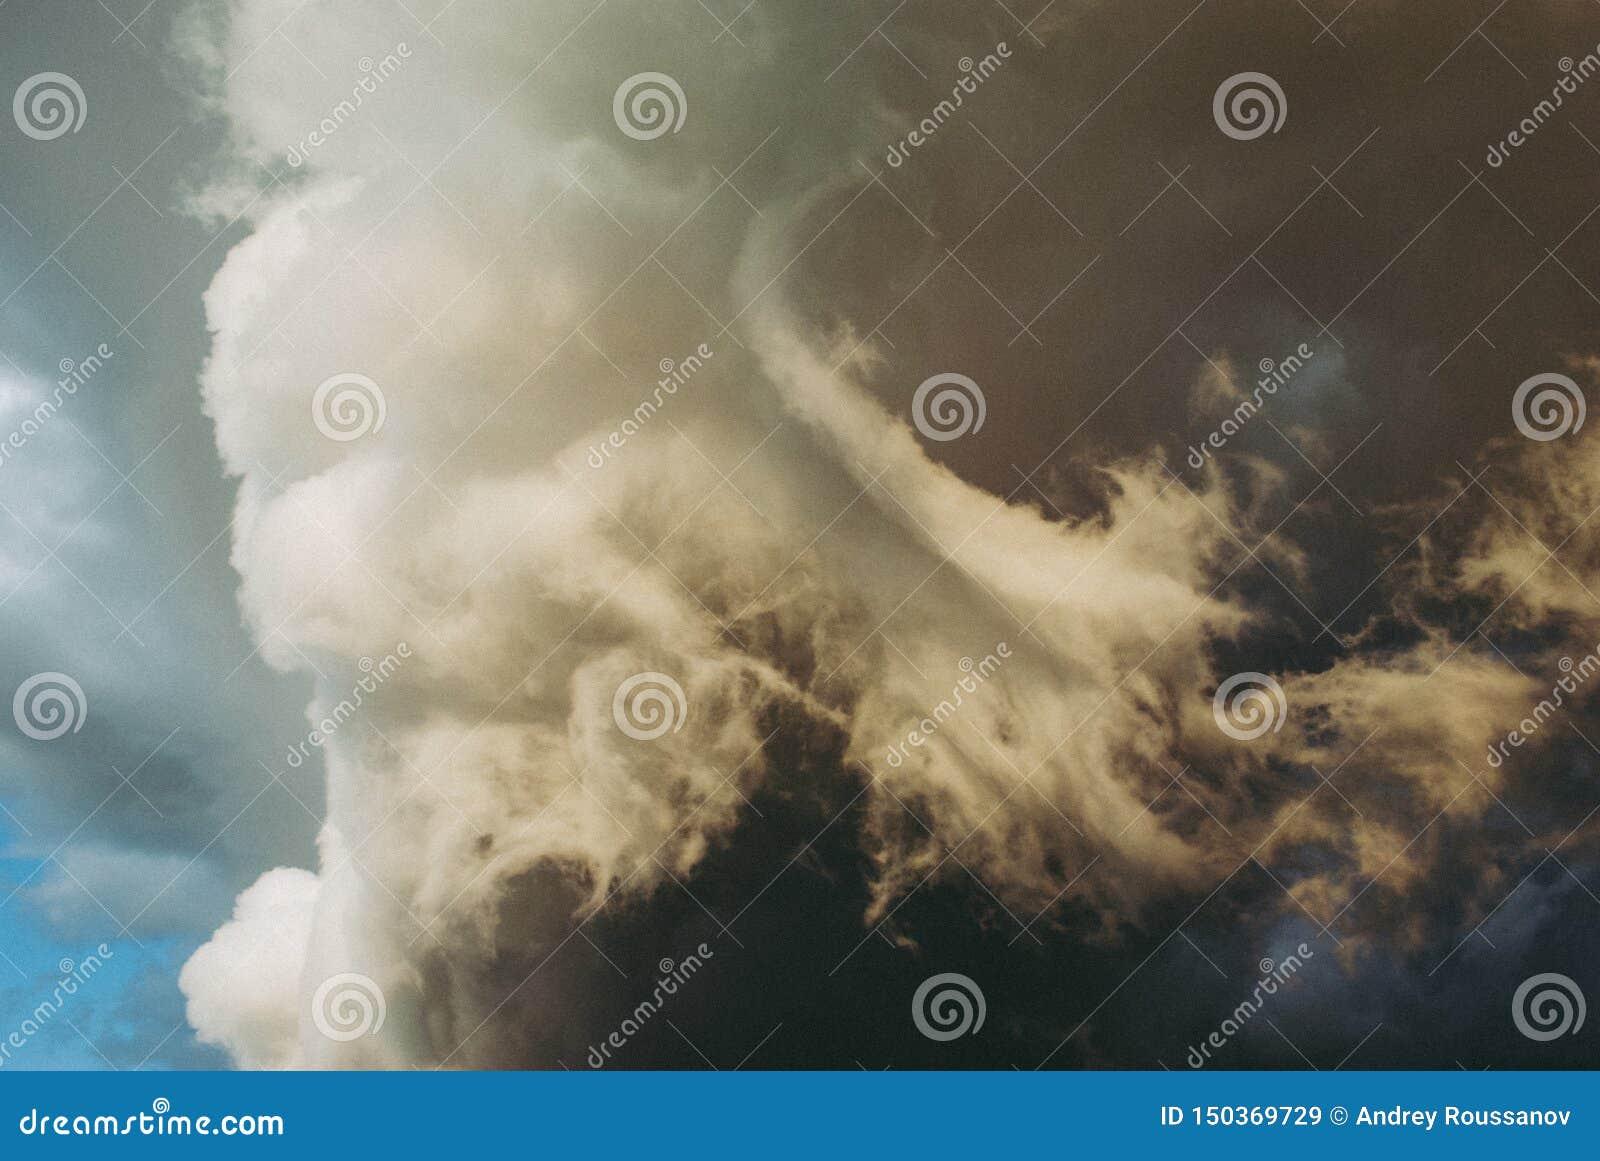 Background symbolizing the power of the elements.